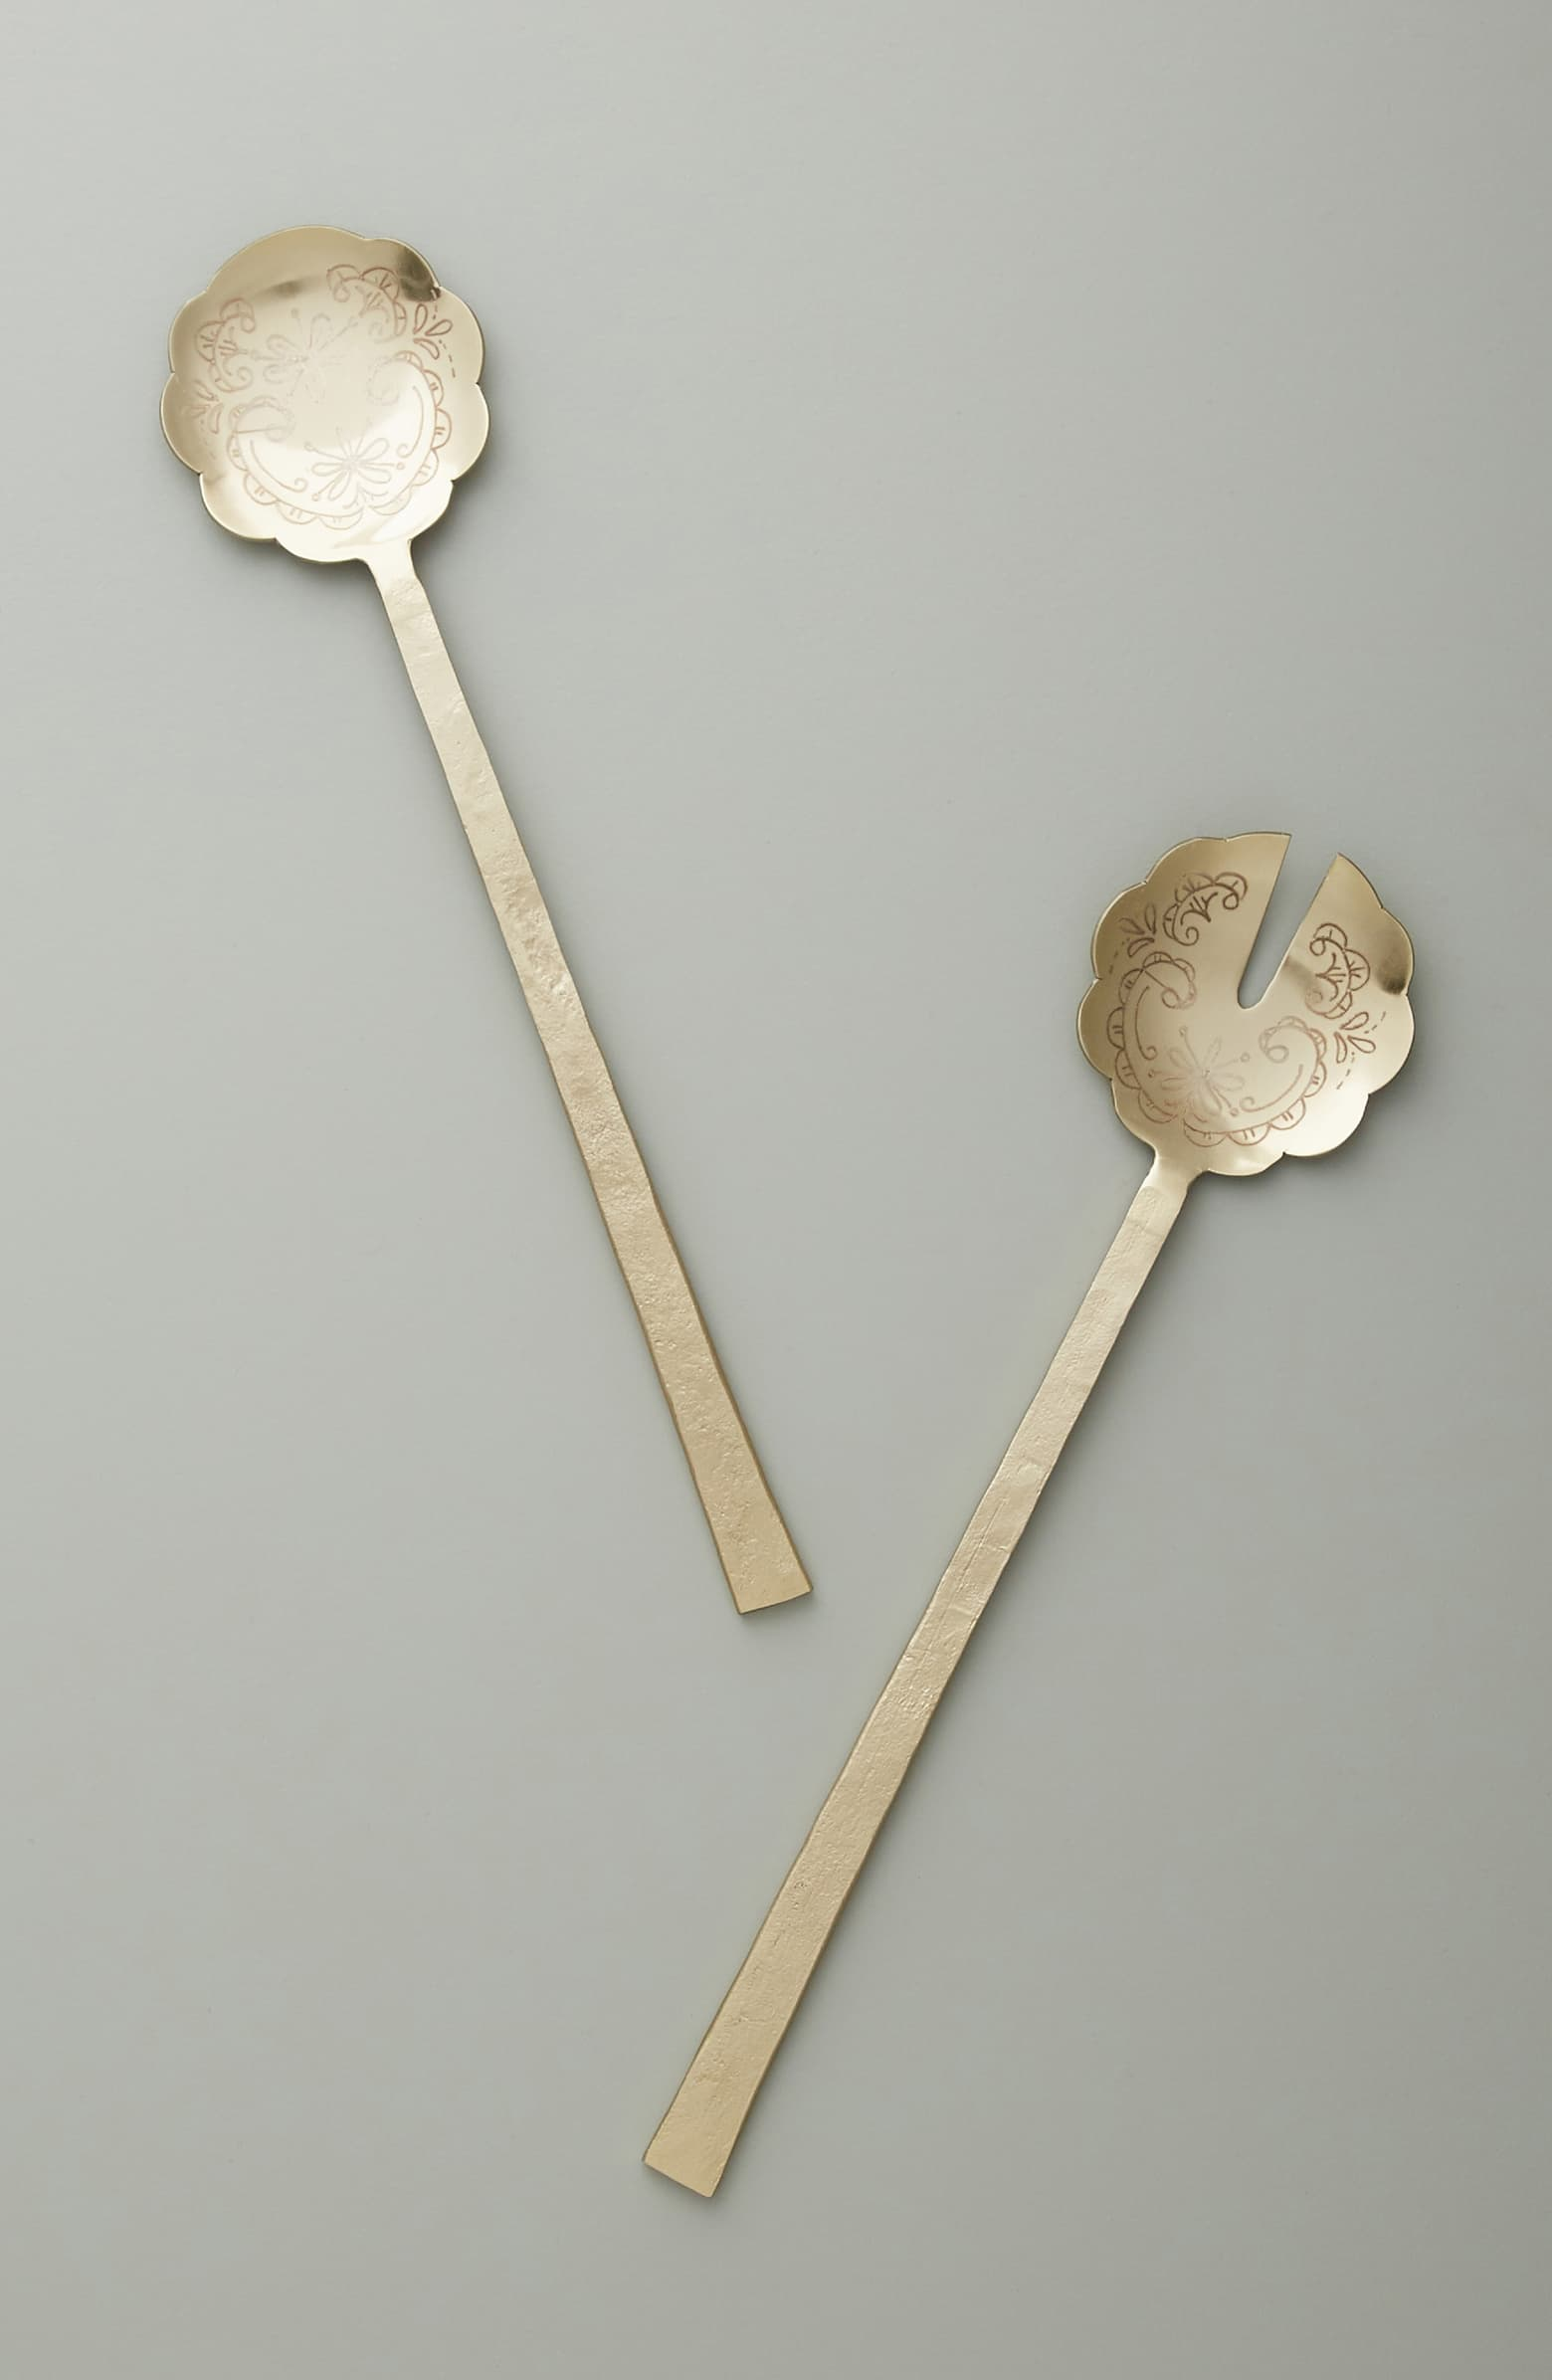 Anthropologie Naomi 2-Piece Servingware Set